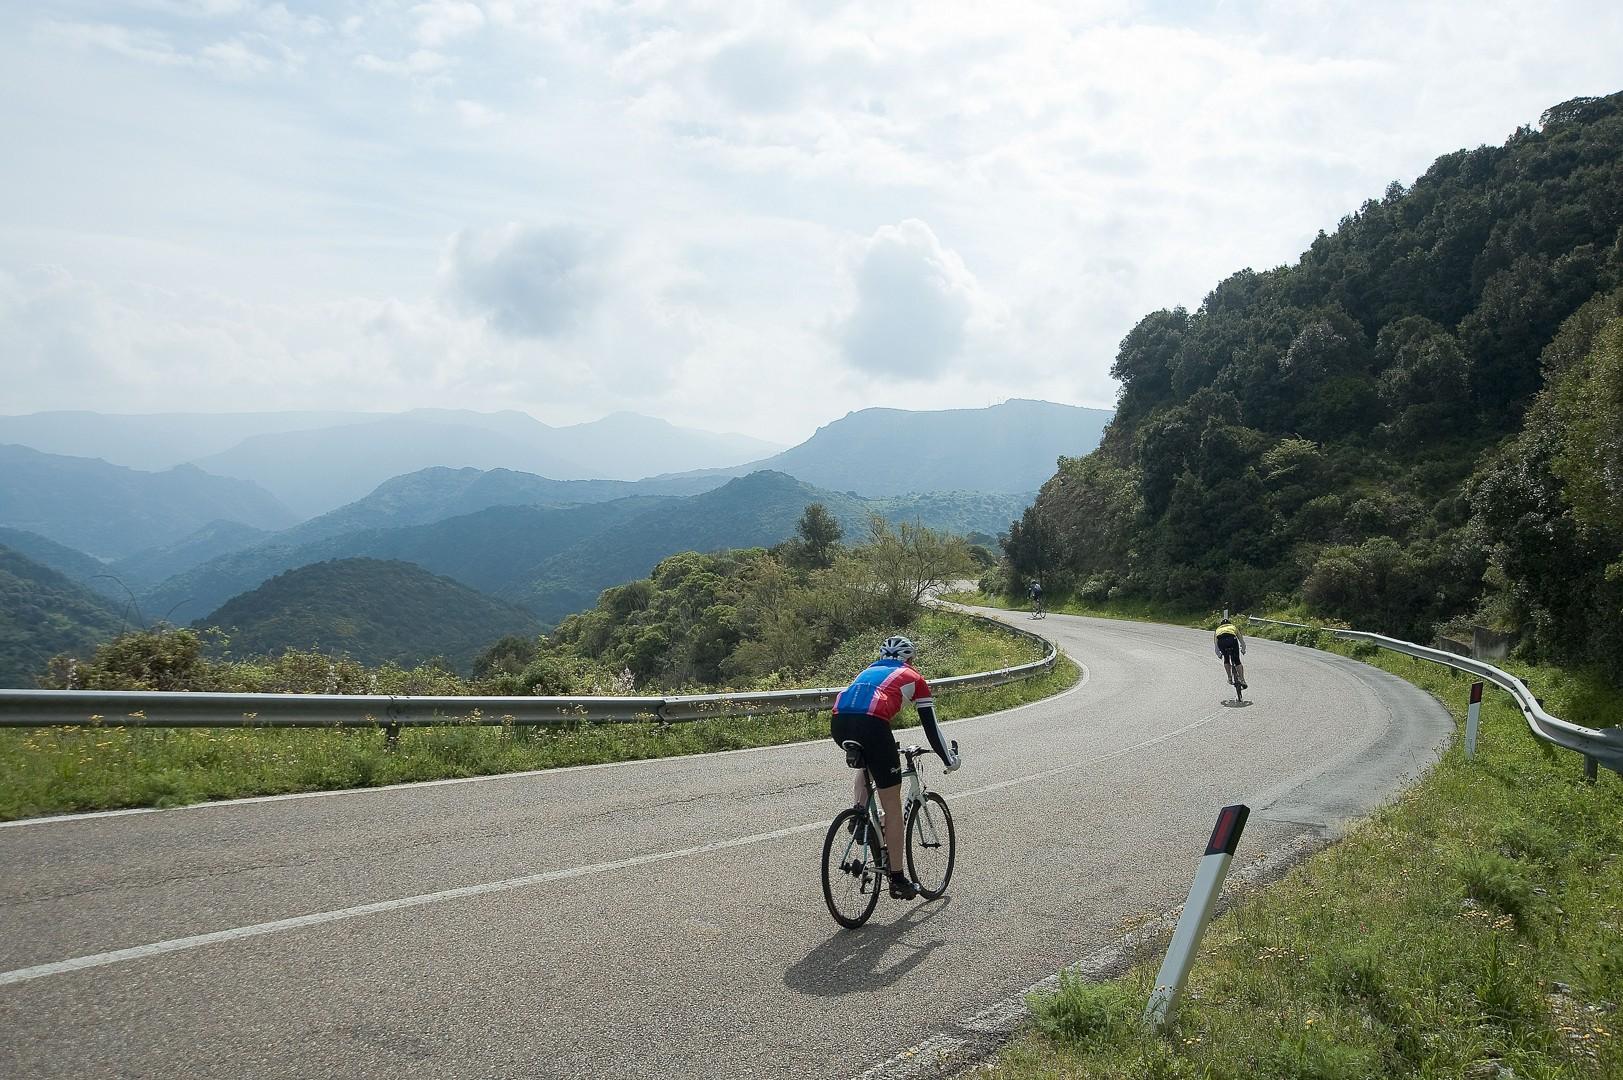 SP2105.jpg - Italy - Sardinia - Mountain Explorer - Guided Road Cycling Holiday - Italia Road Cycling